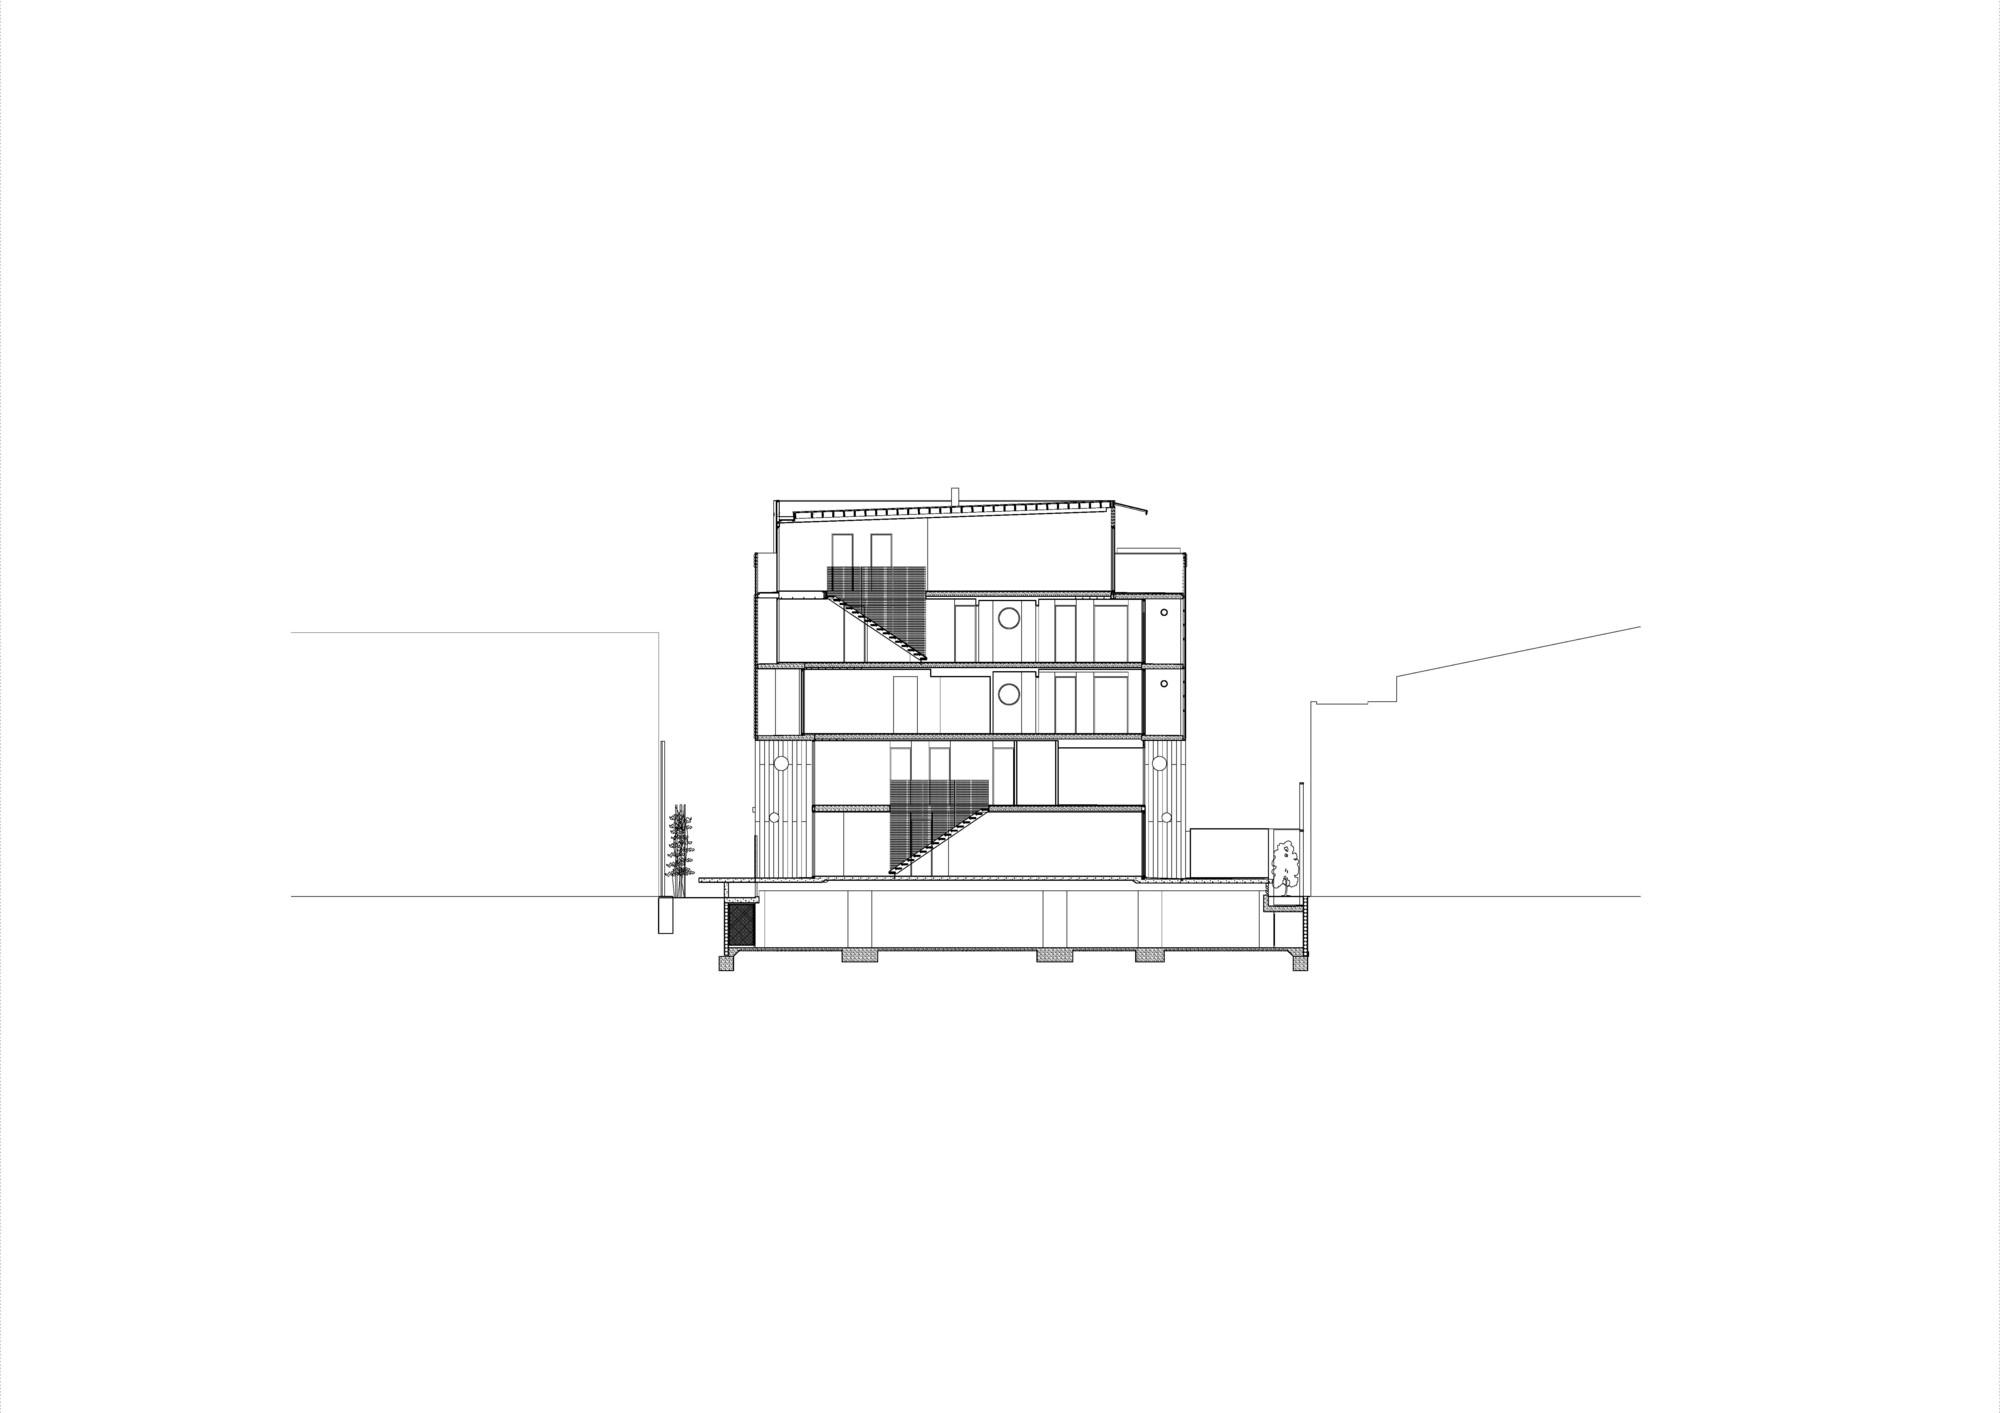 Hue Apartments / Jackson Clements Burrows Architects